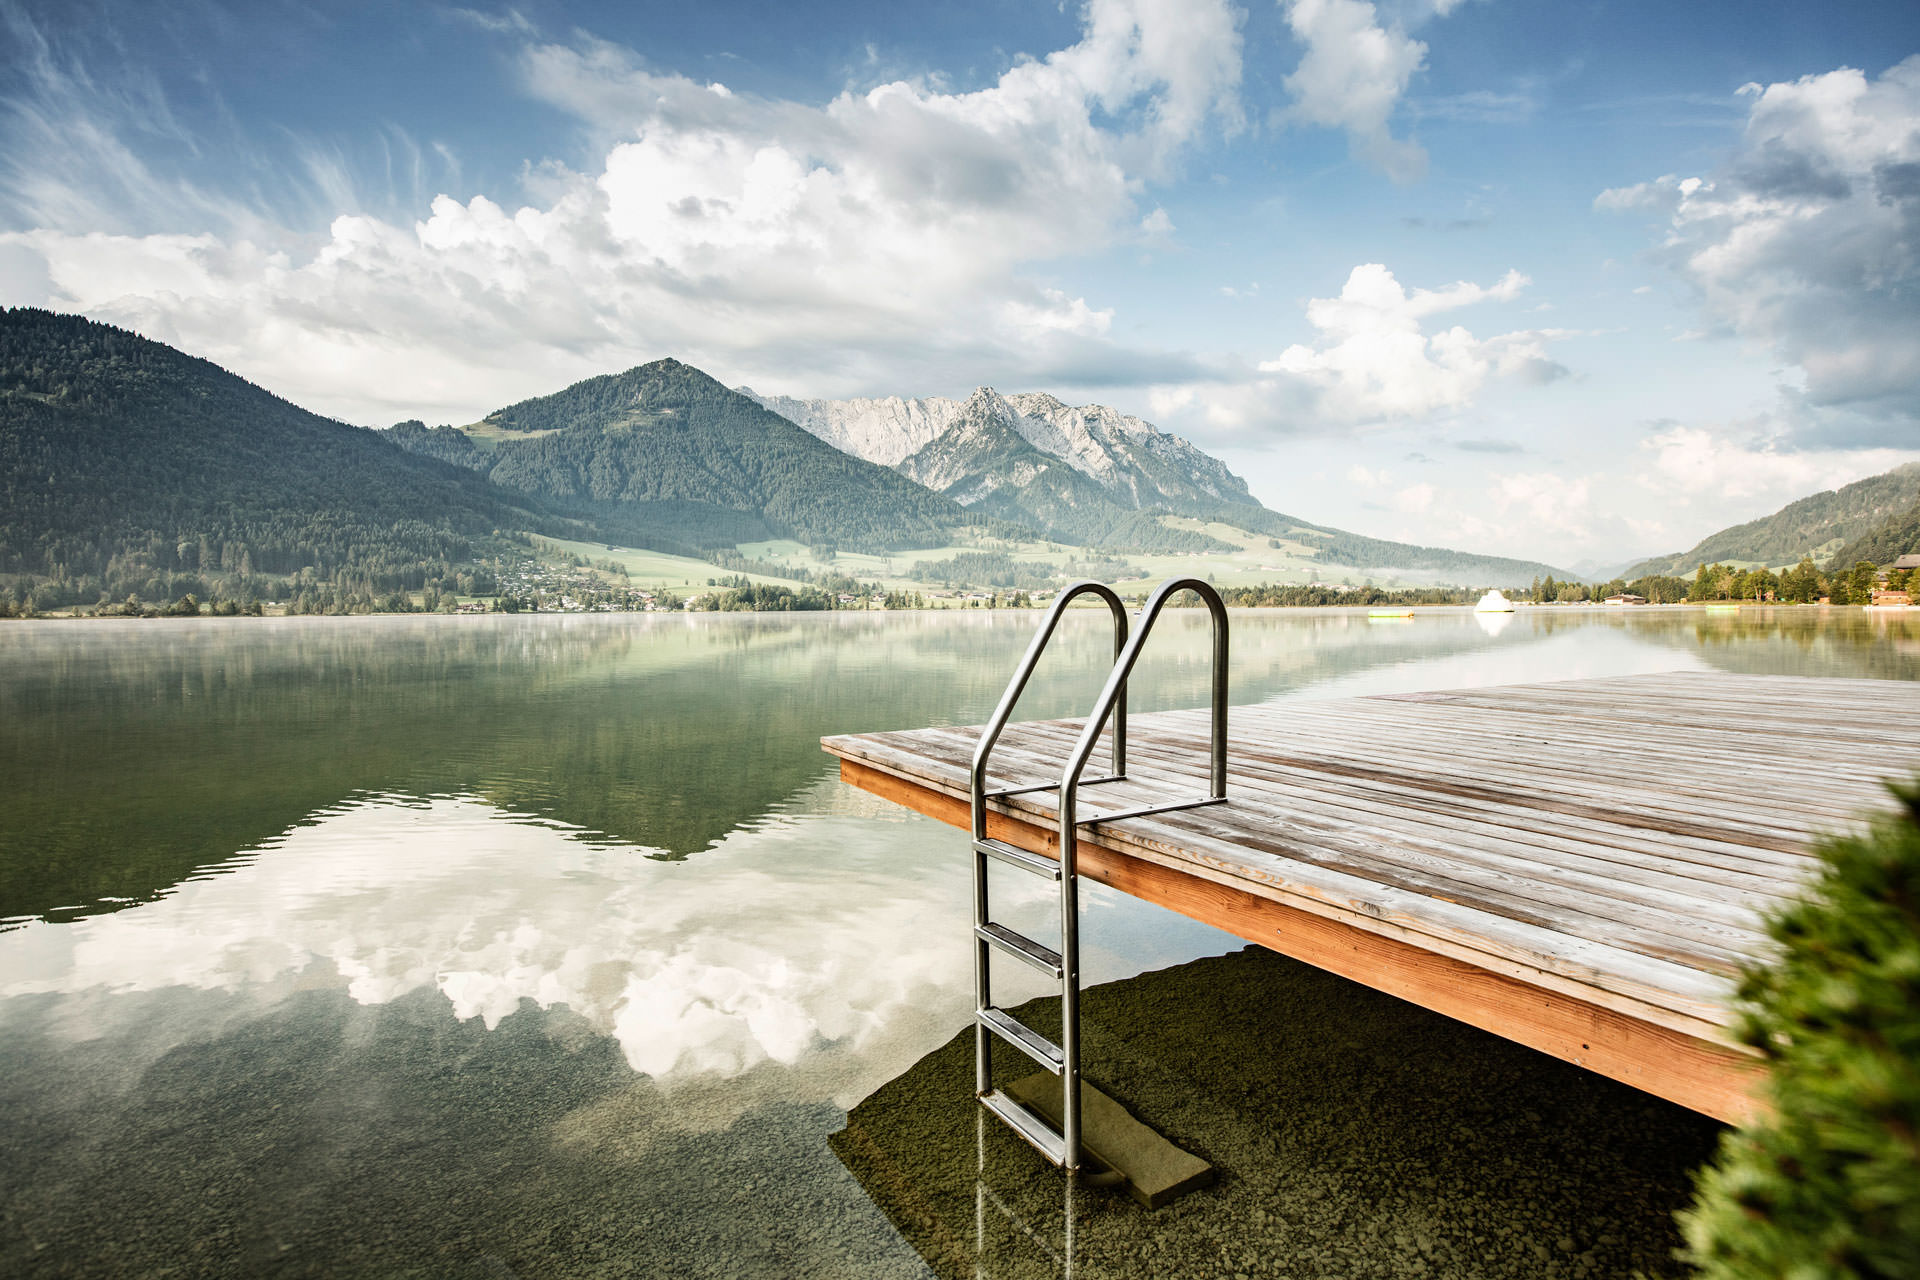 Urlaub am see in tirol seehotel brunner am walchsee for Ferien am see